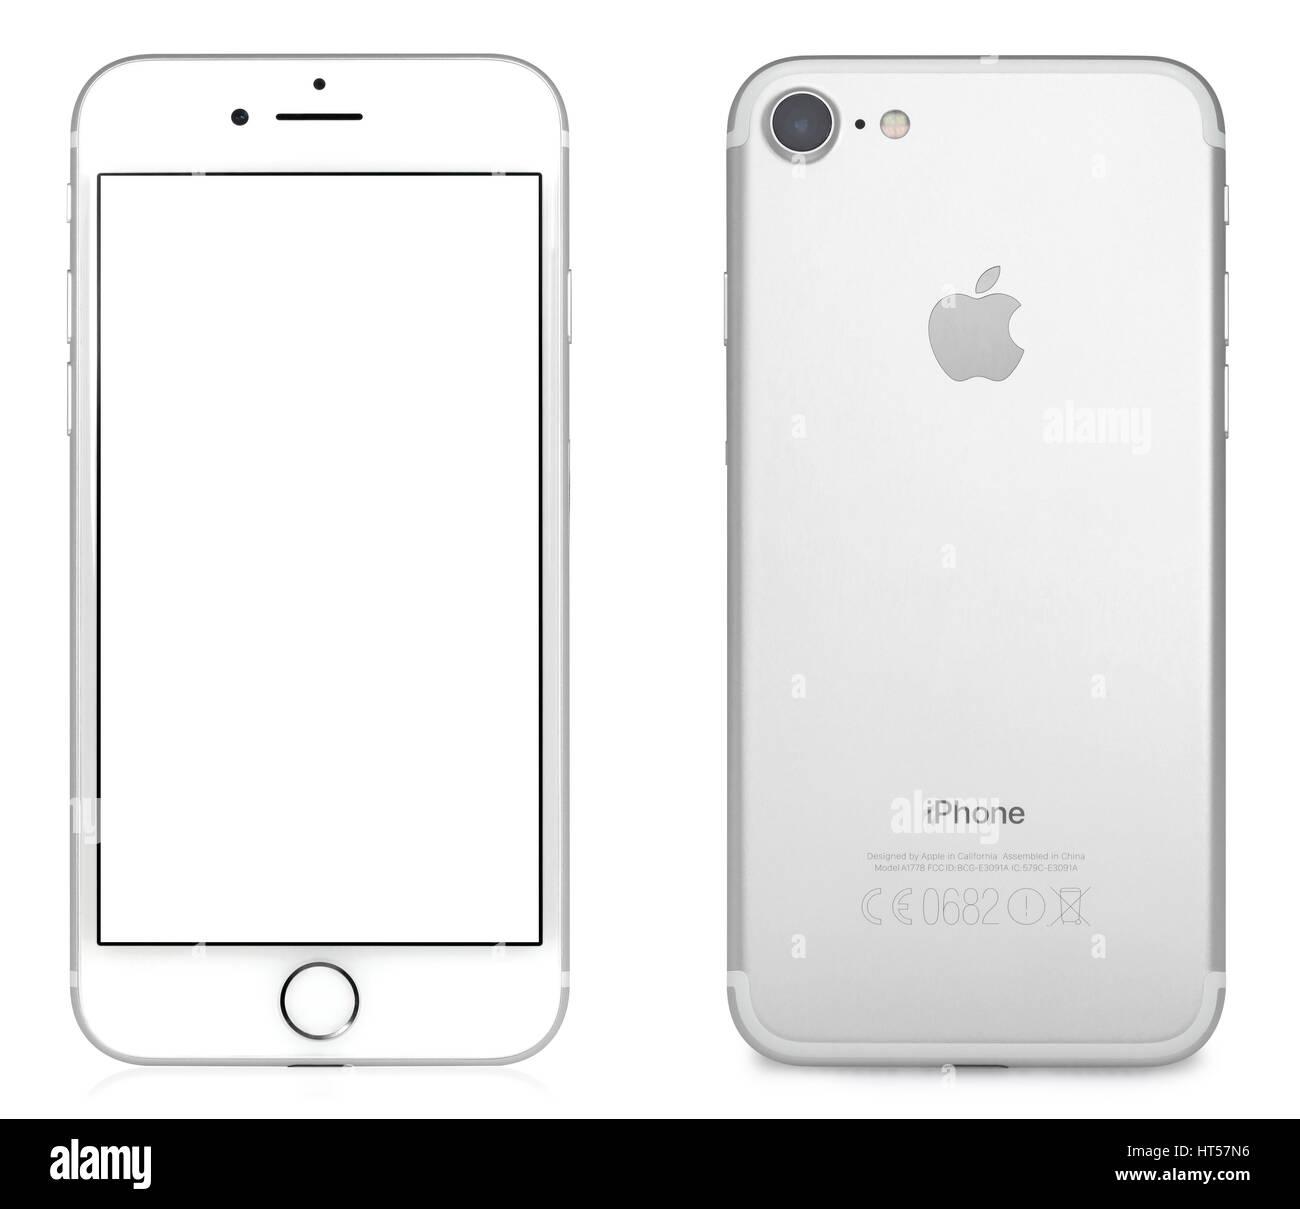 Koszalin, Poland – February 09, 2017: silver iPhone 7 with